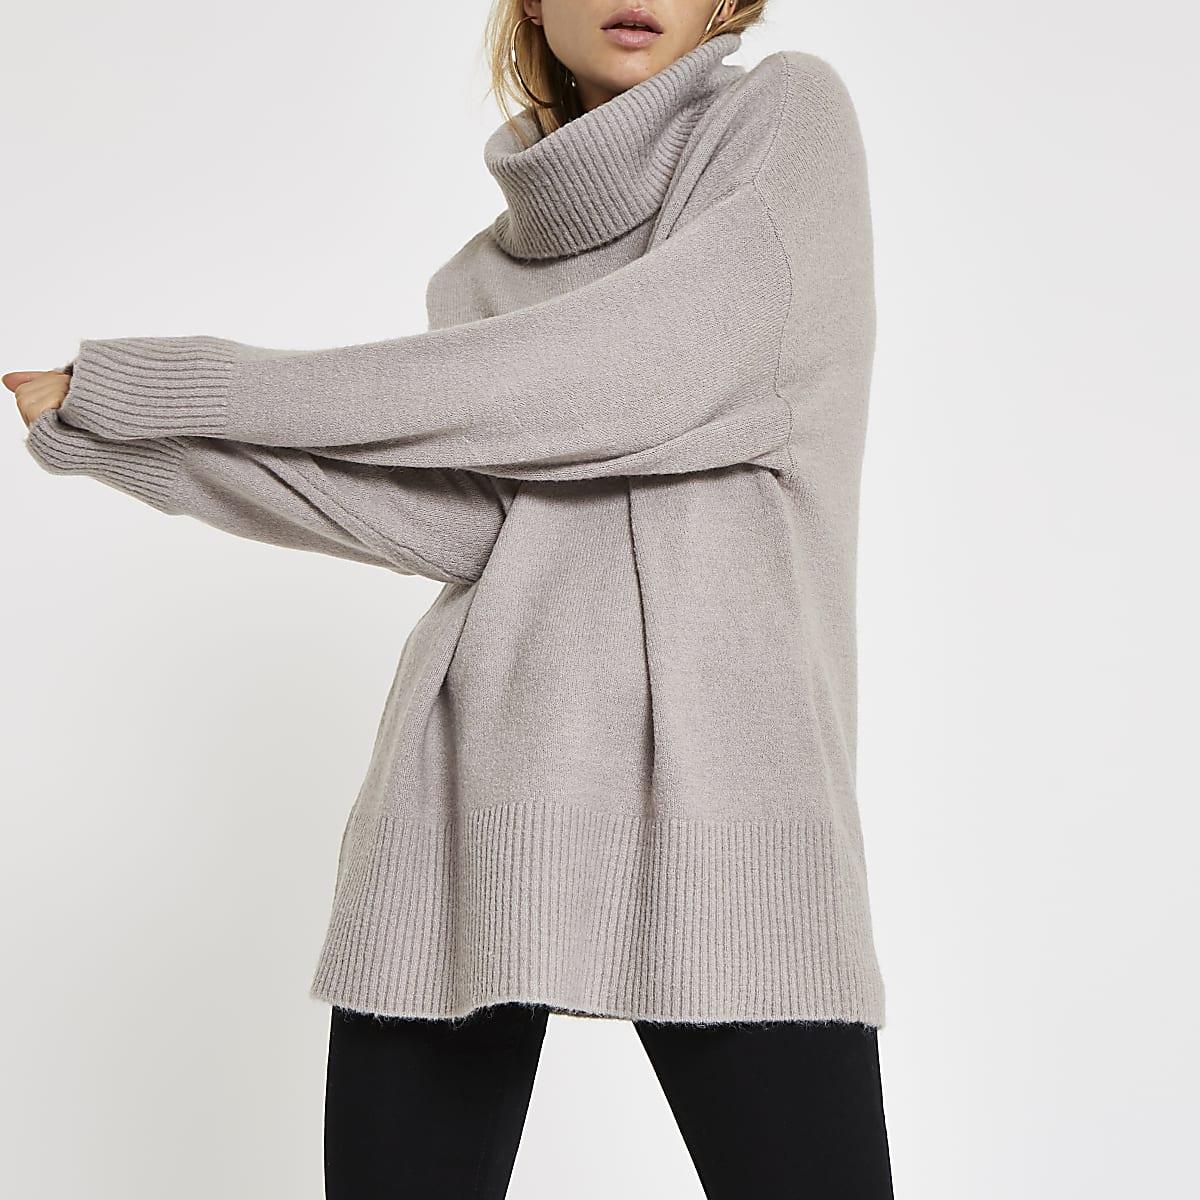 4b0bf8f6ec6 Grey oversized roll neck jumper